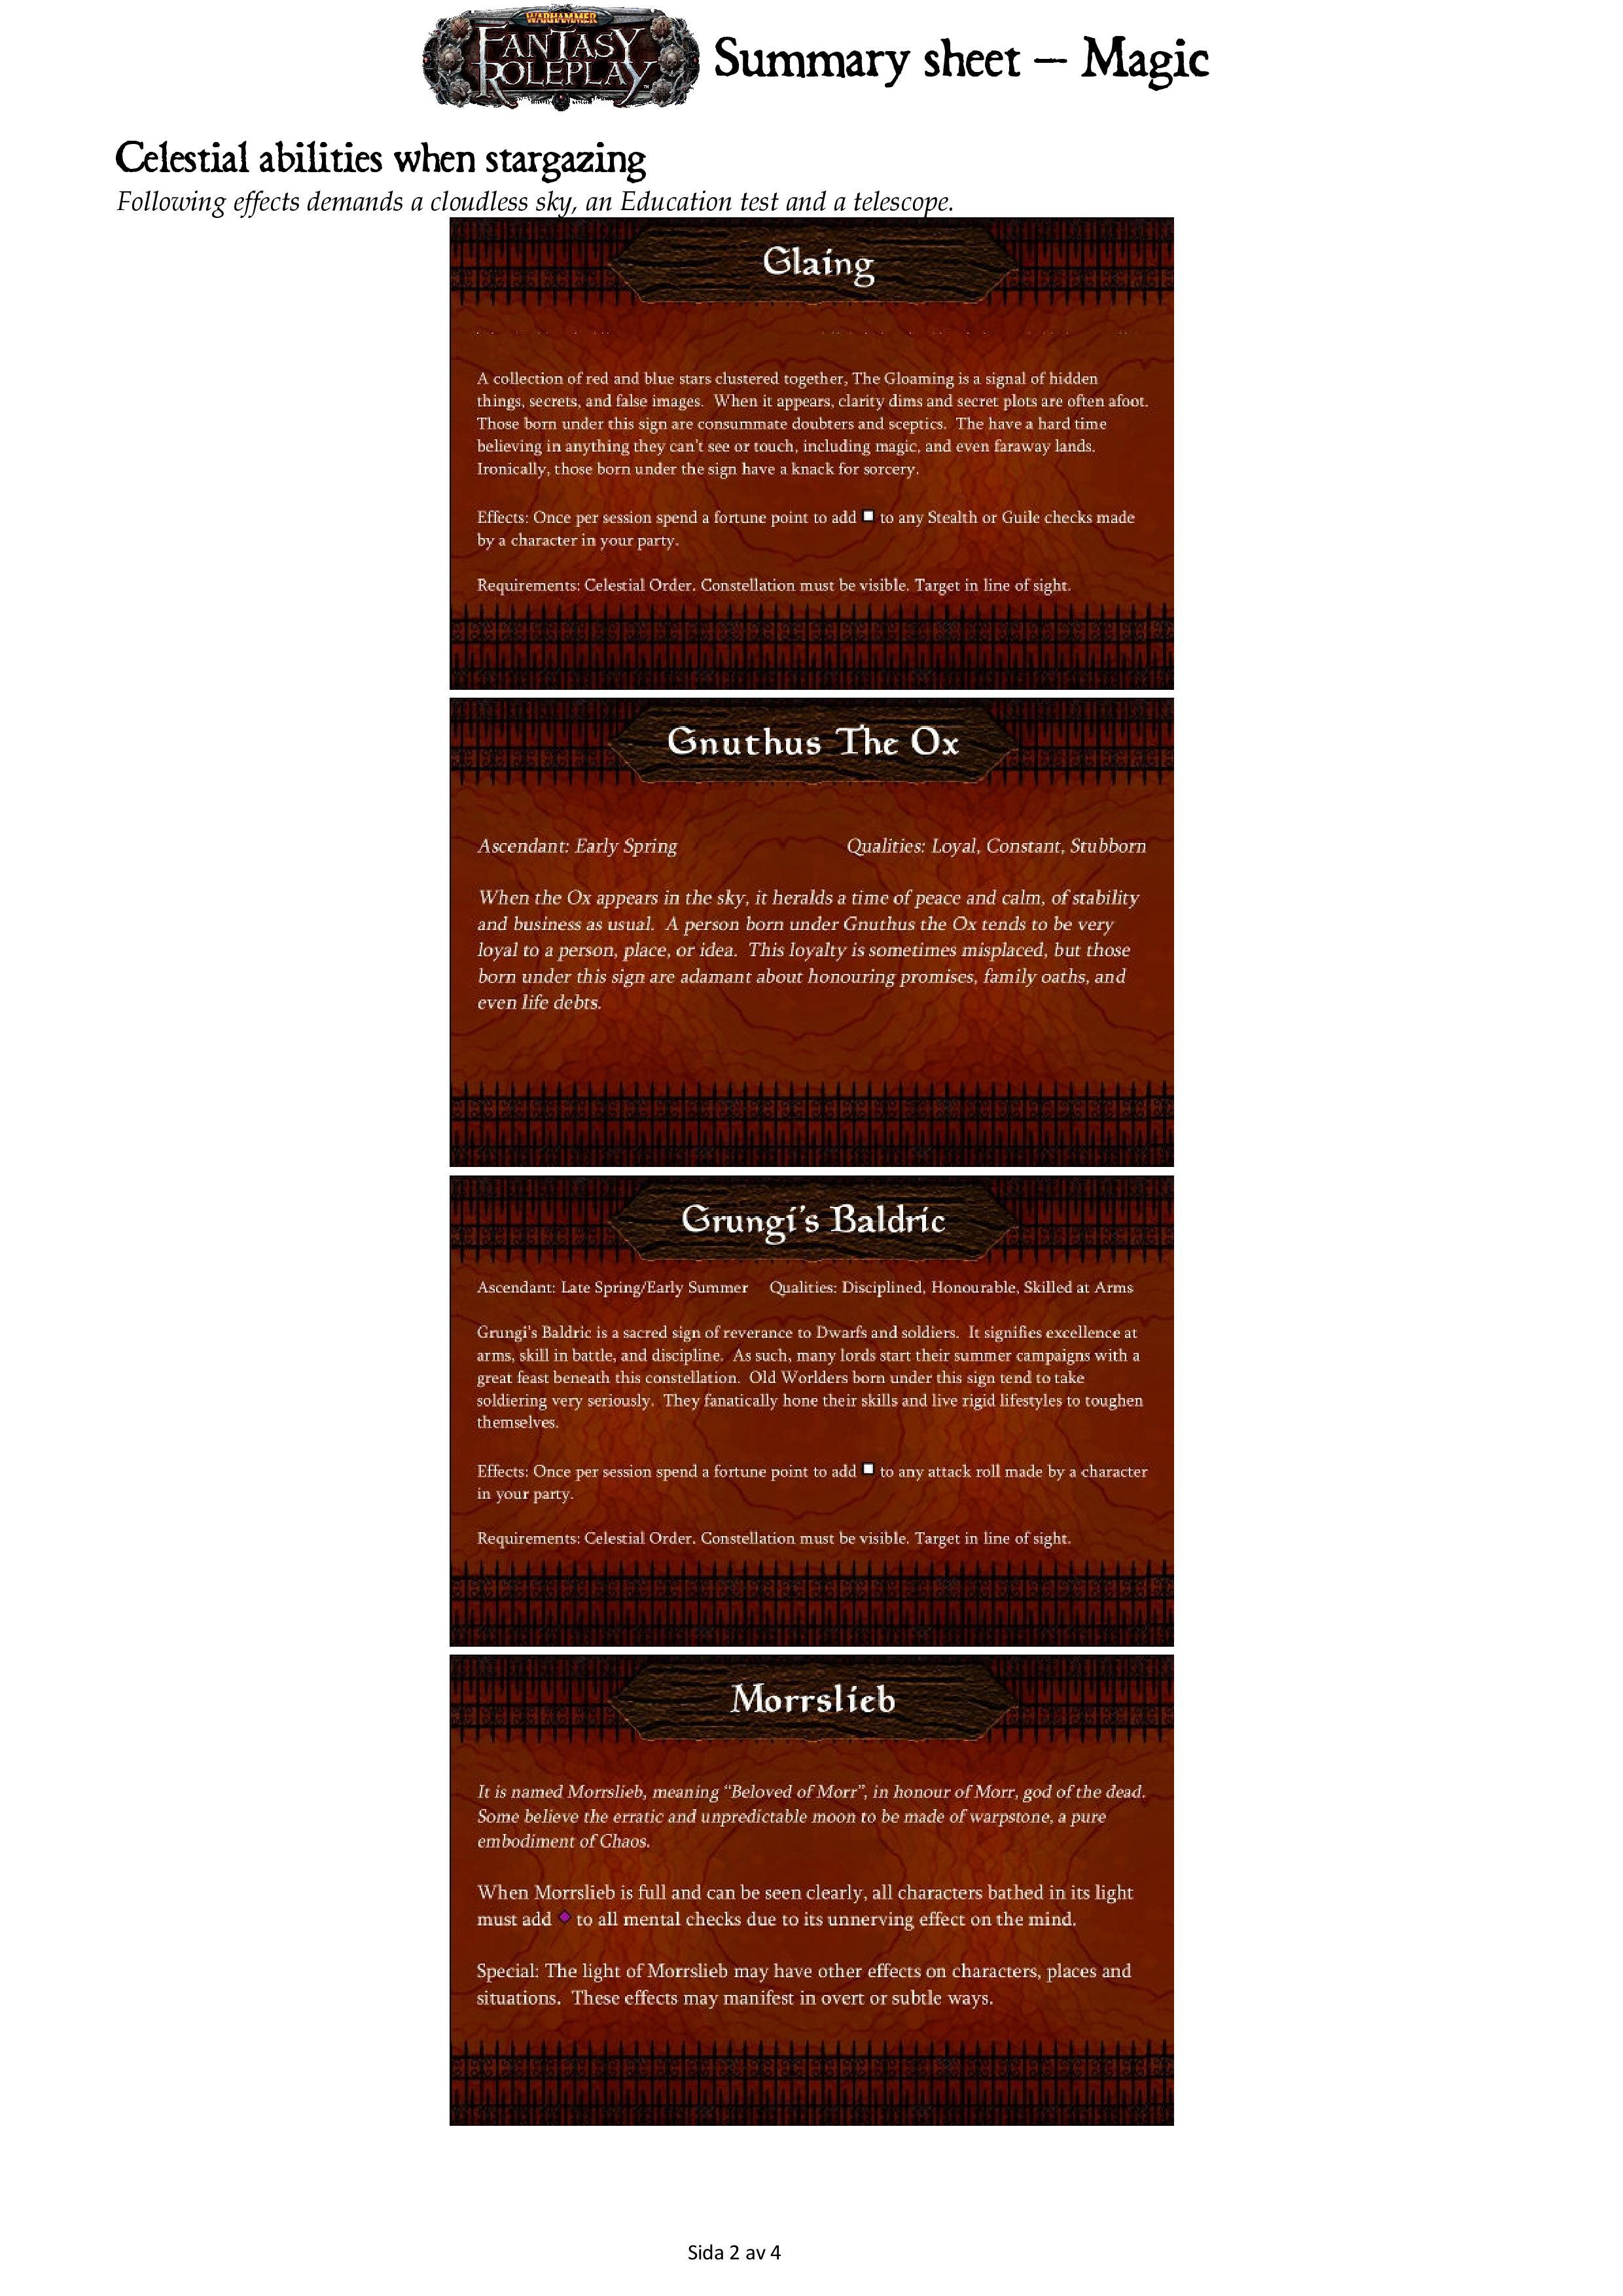 WFRP_3ed_Summary_Sheet_-_Magic-page-002.jpg